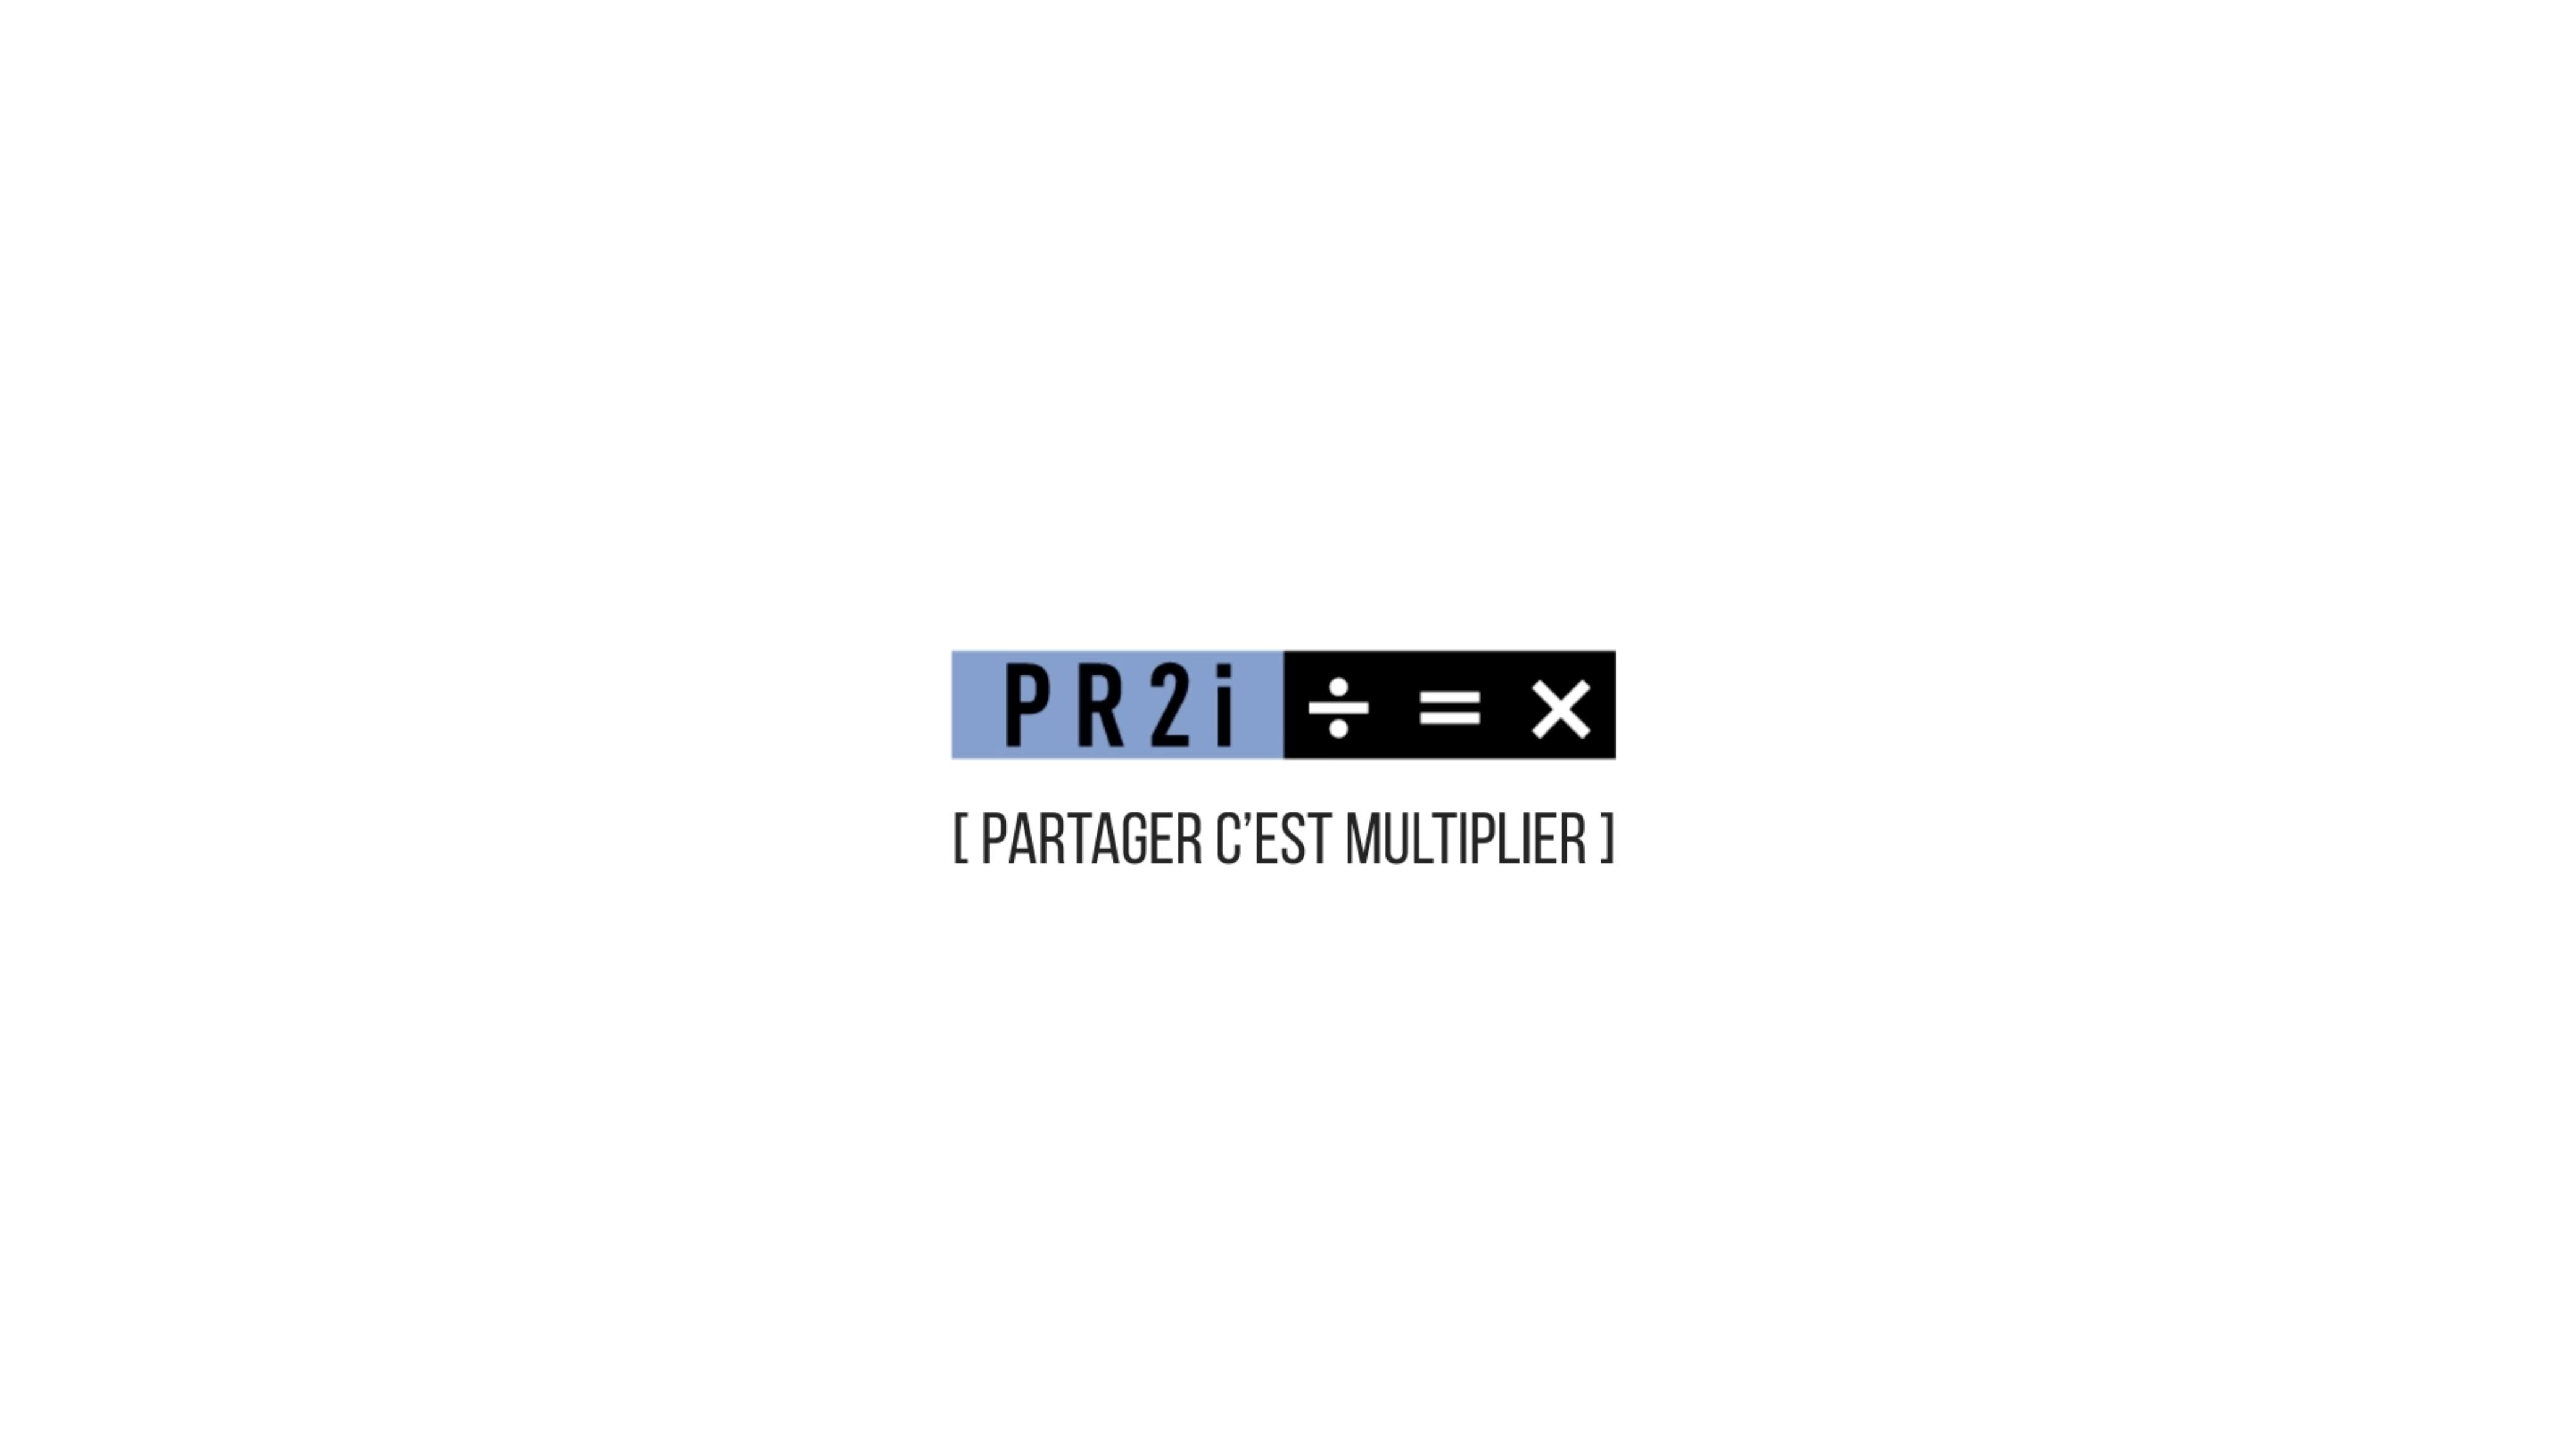 logo-PR2i-specialiste-services-informatique-si